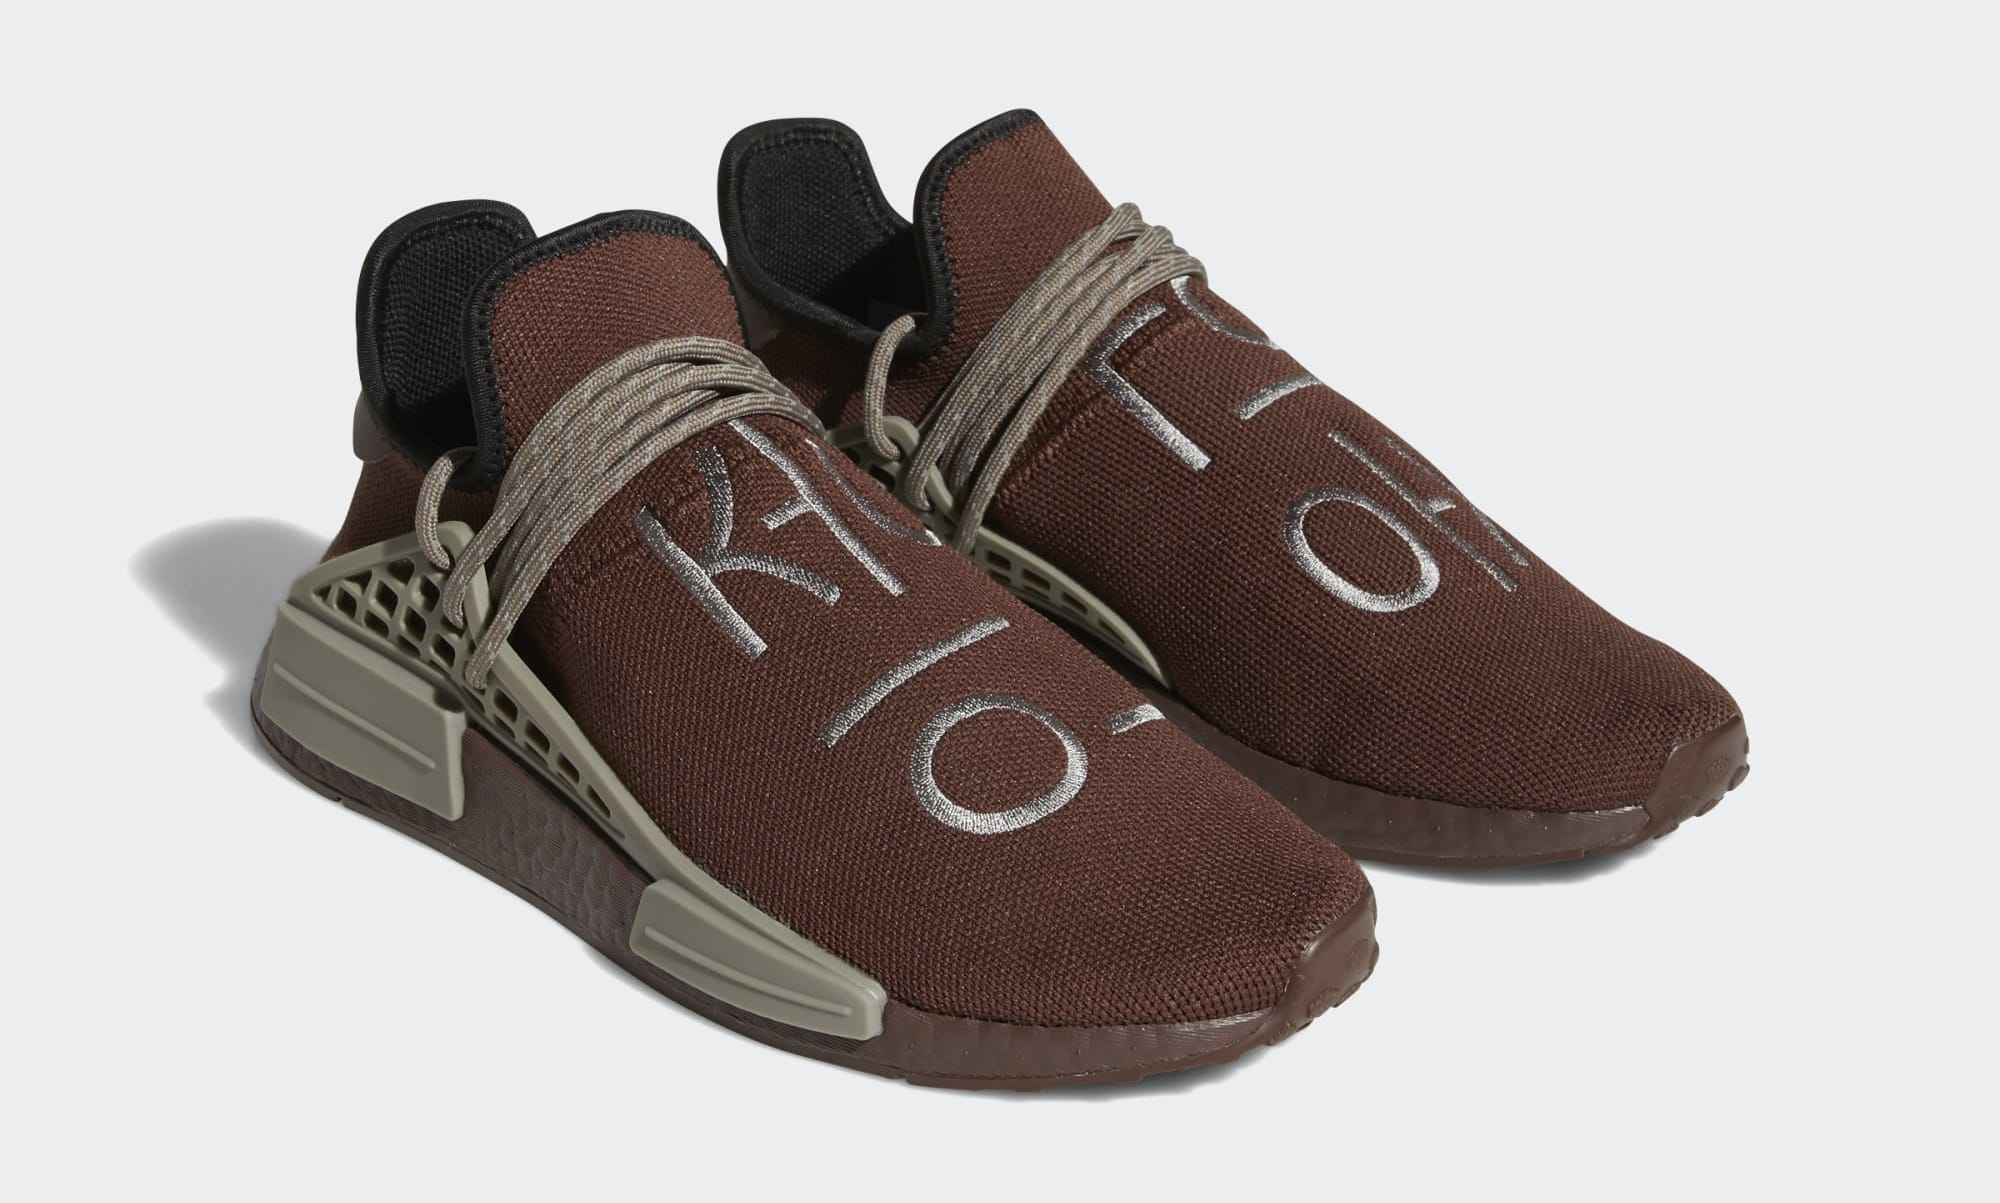 Pharrell Adidas NMD Hu Brown GY0090 Pair